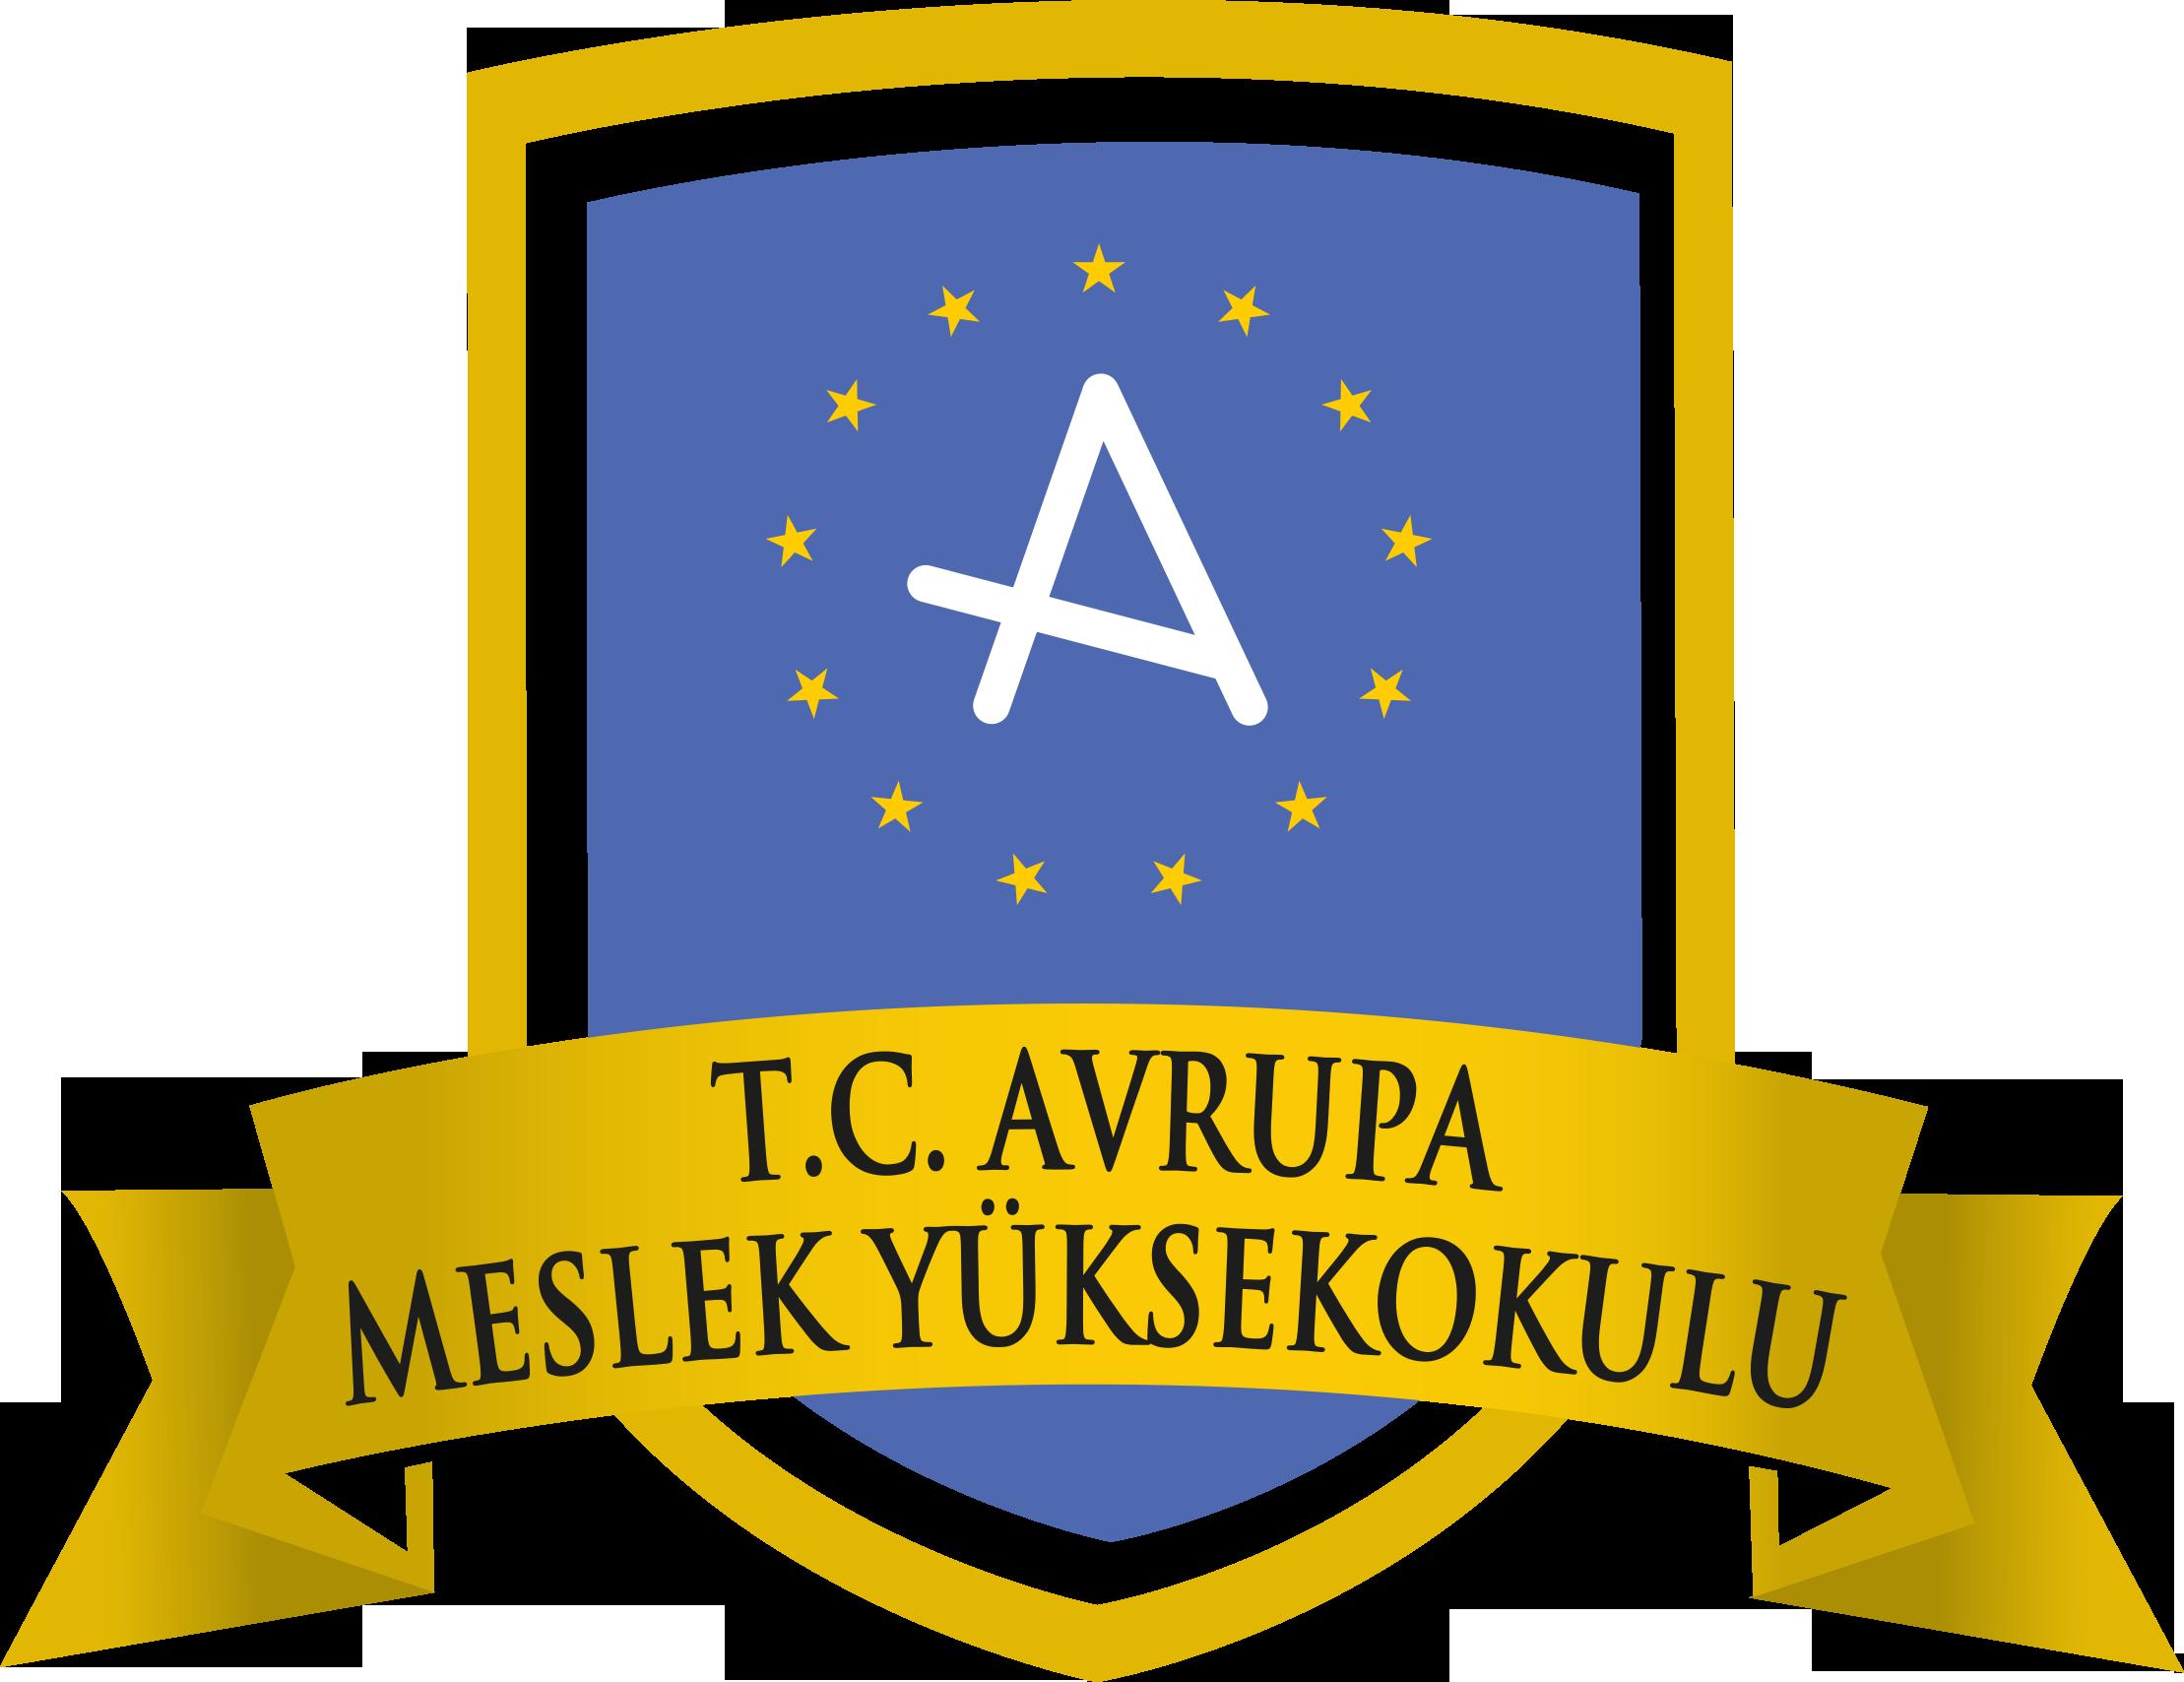 Avrupa Meslek Yüksekokulu Fizyoterapi